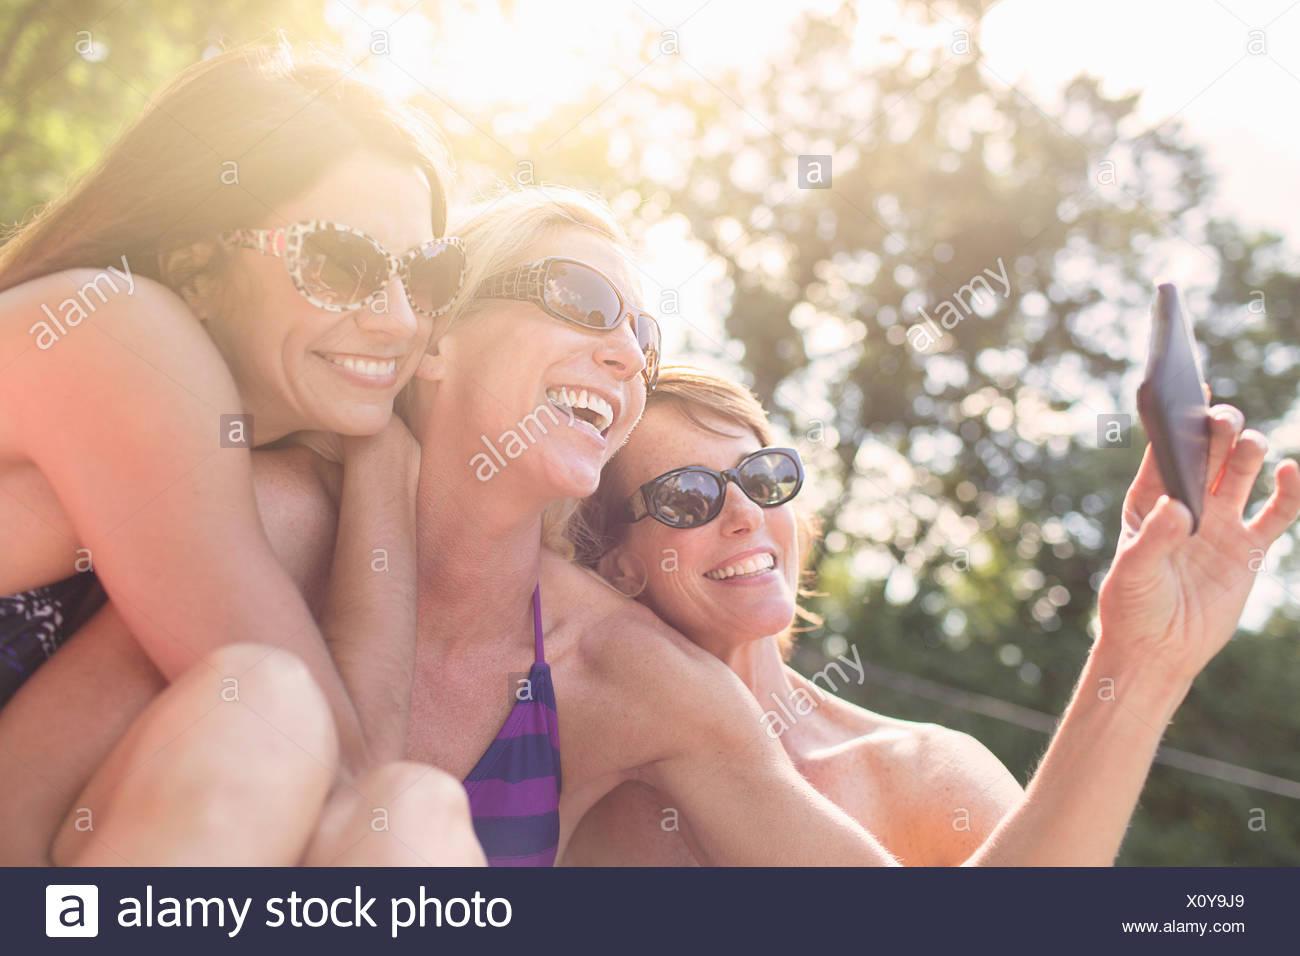 Drei Reife Frauen in Badebekleidung, Selbstporträt Stockbild